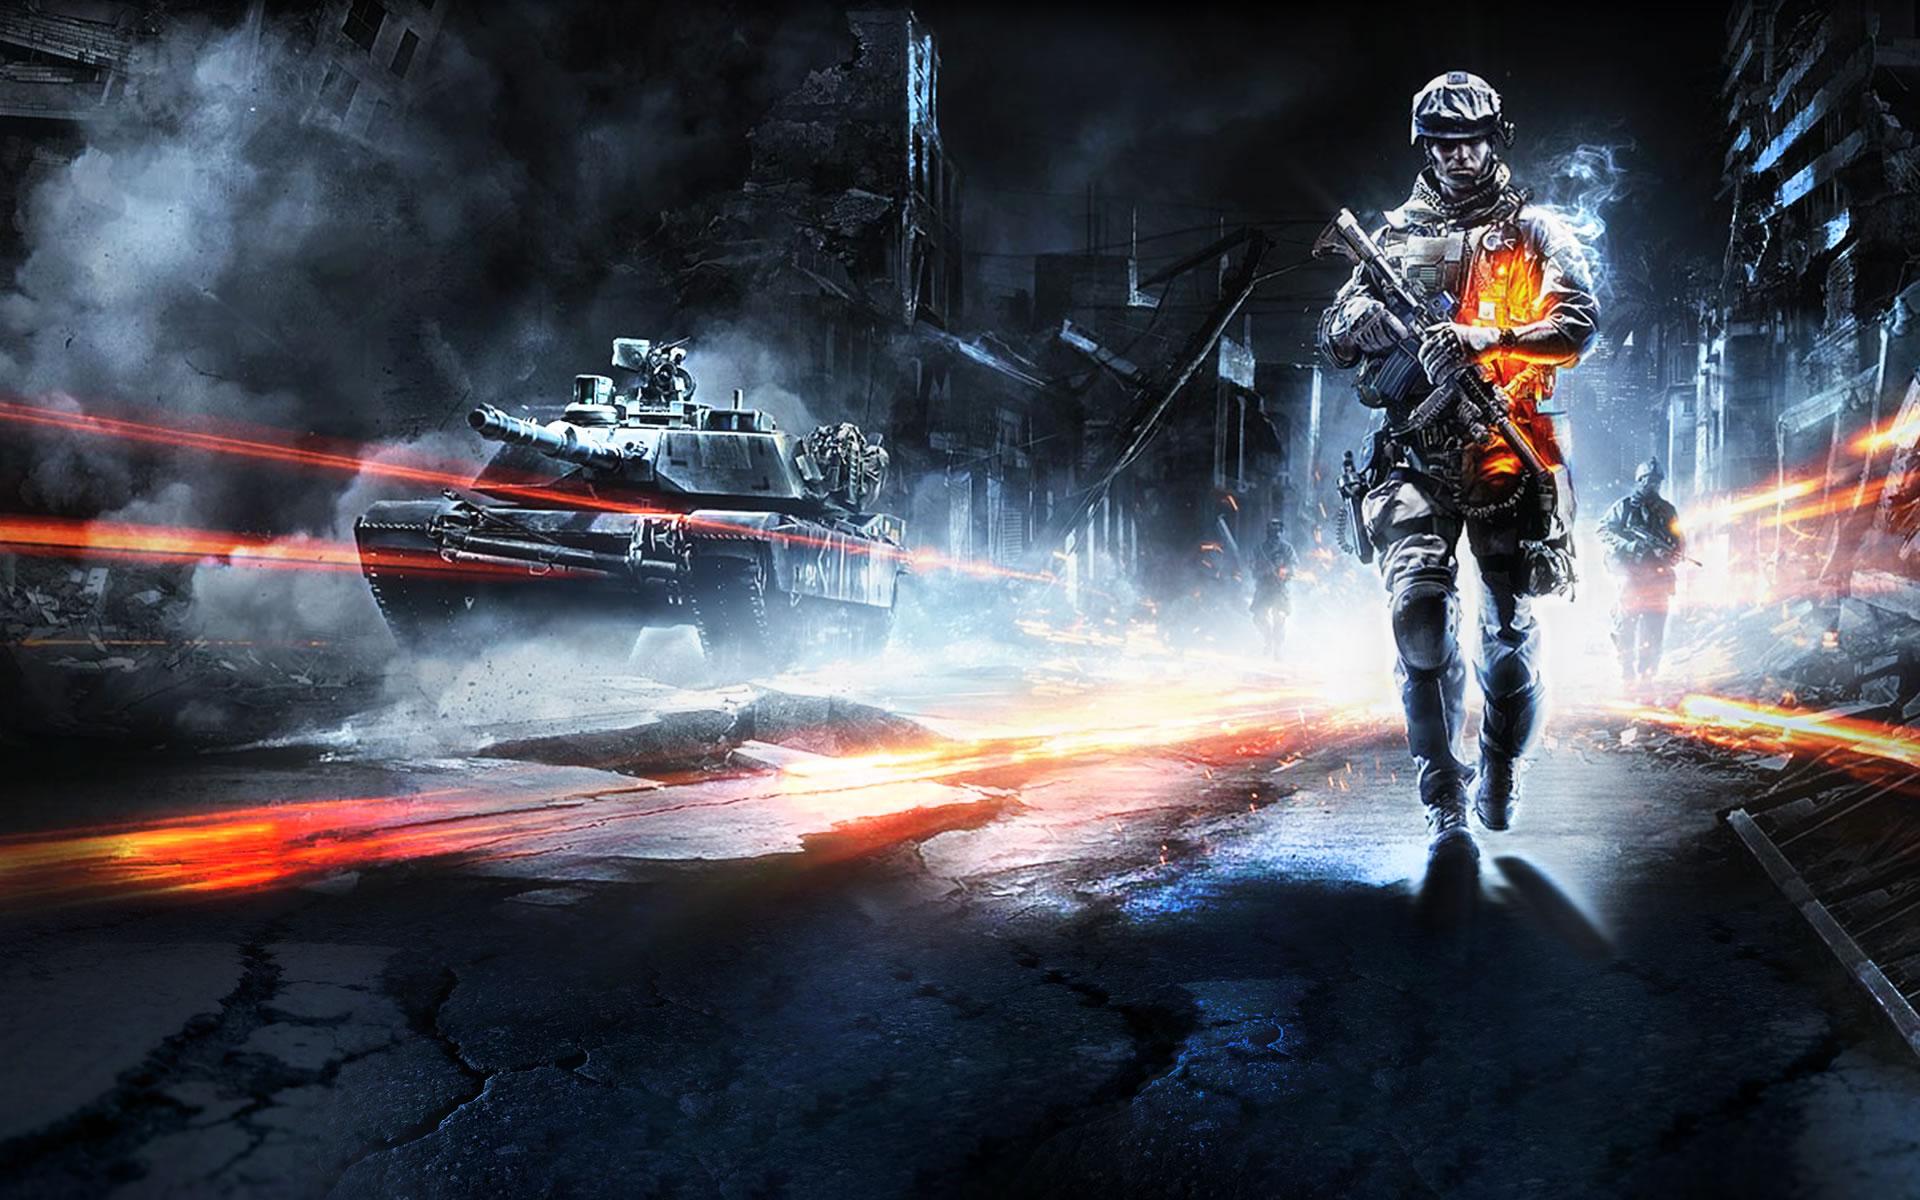 Battlefield 1 4k Ultra Tapeta Hd: Battlefield 3 Fondos De Pantalla